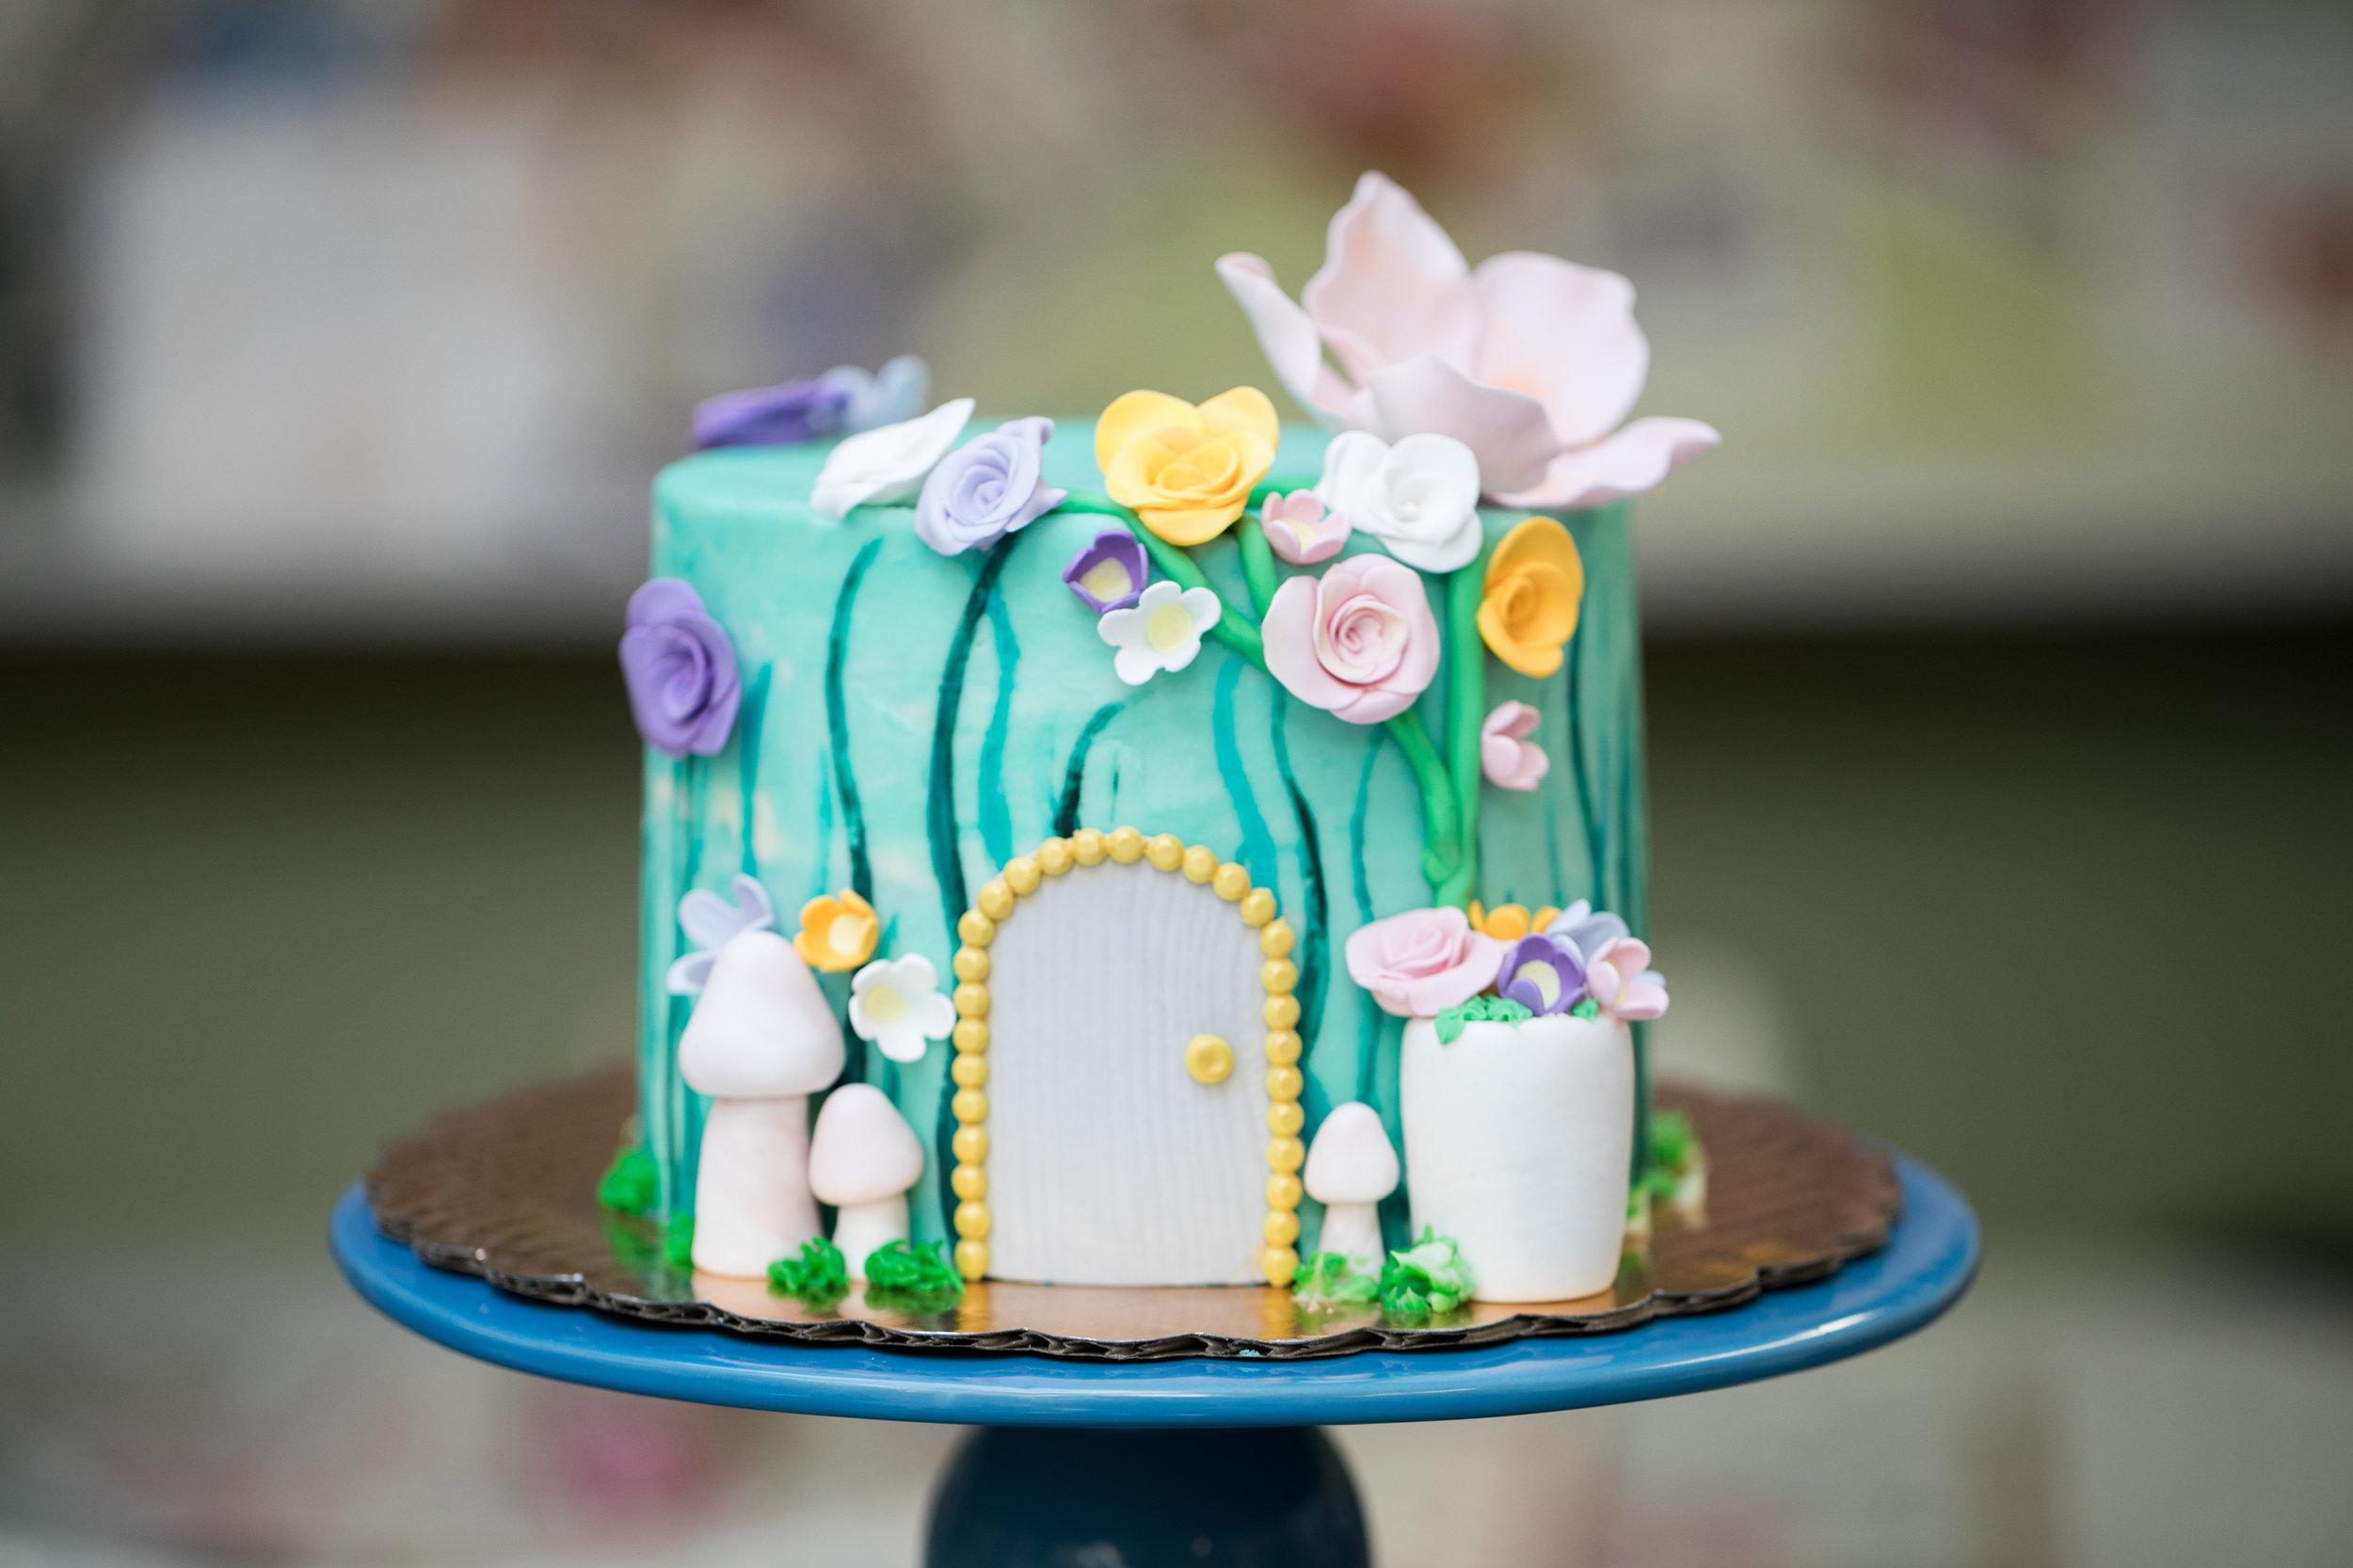 cake-7.jpg